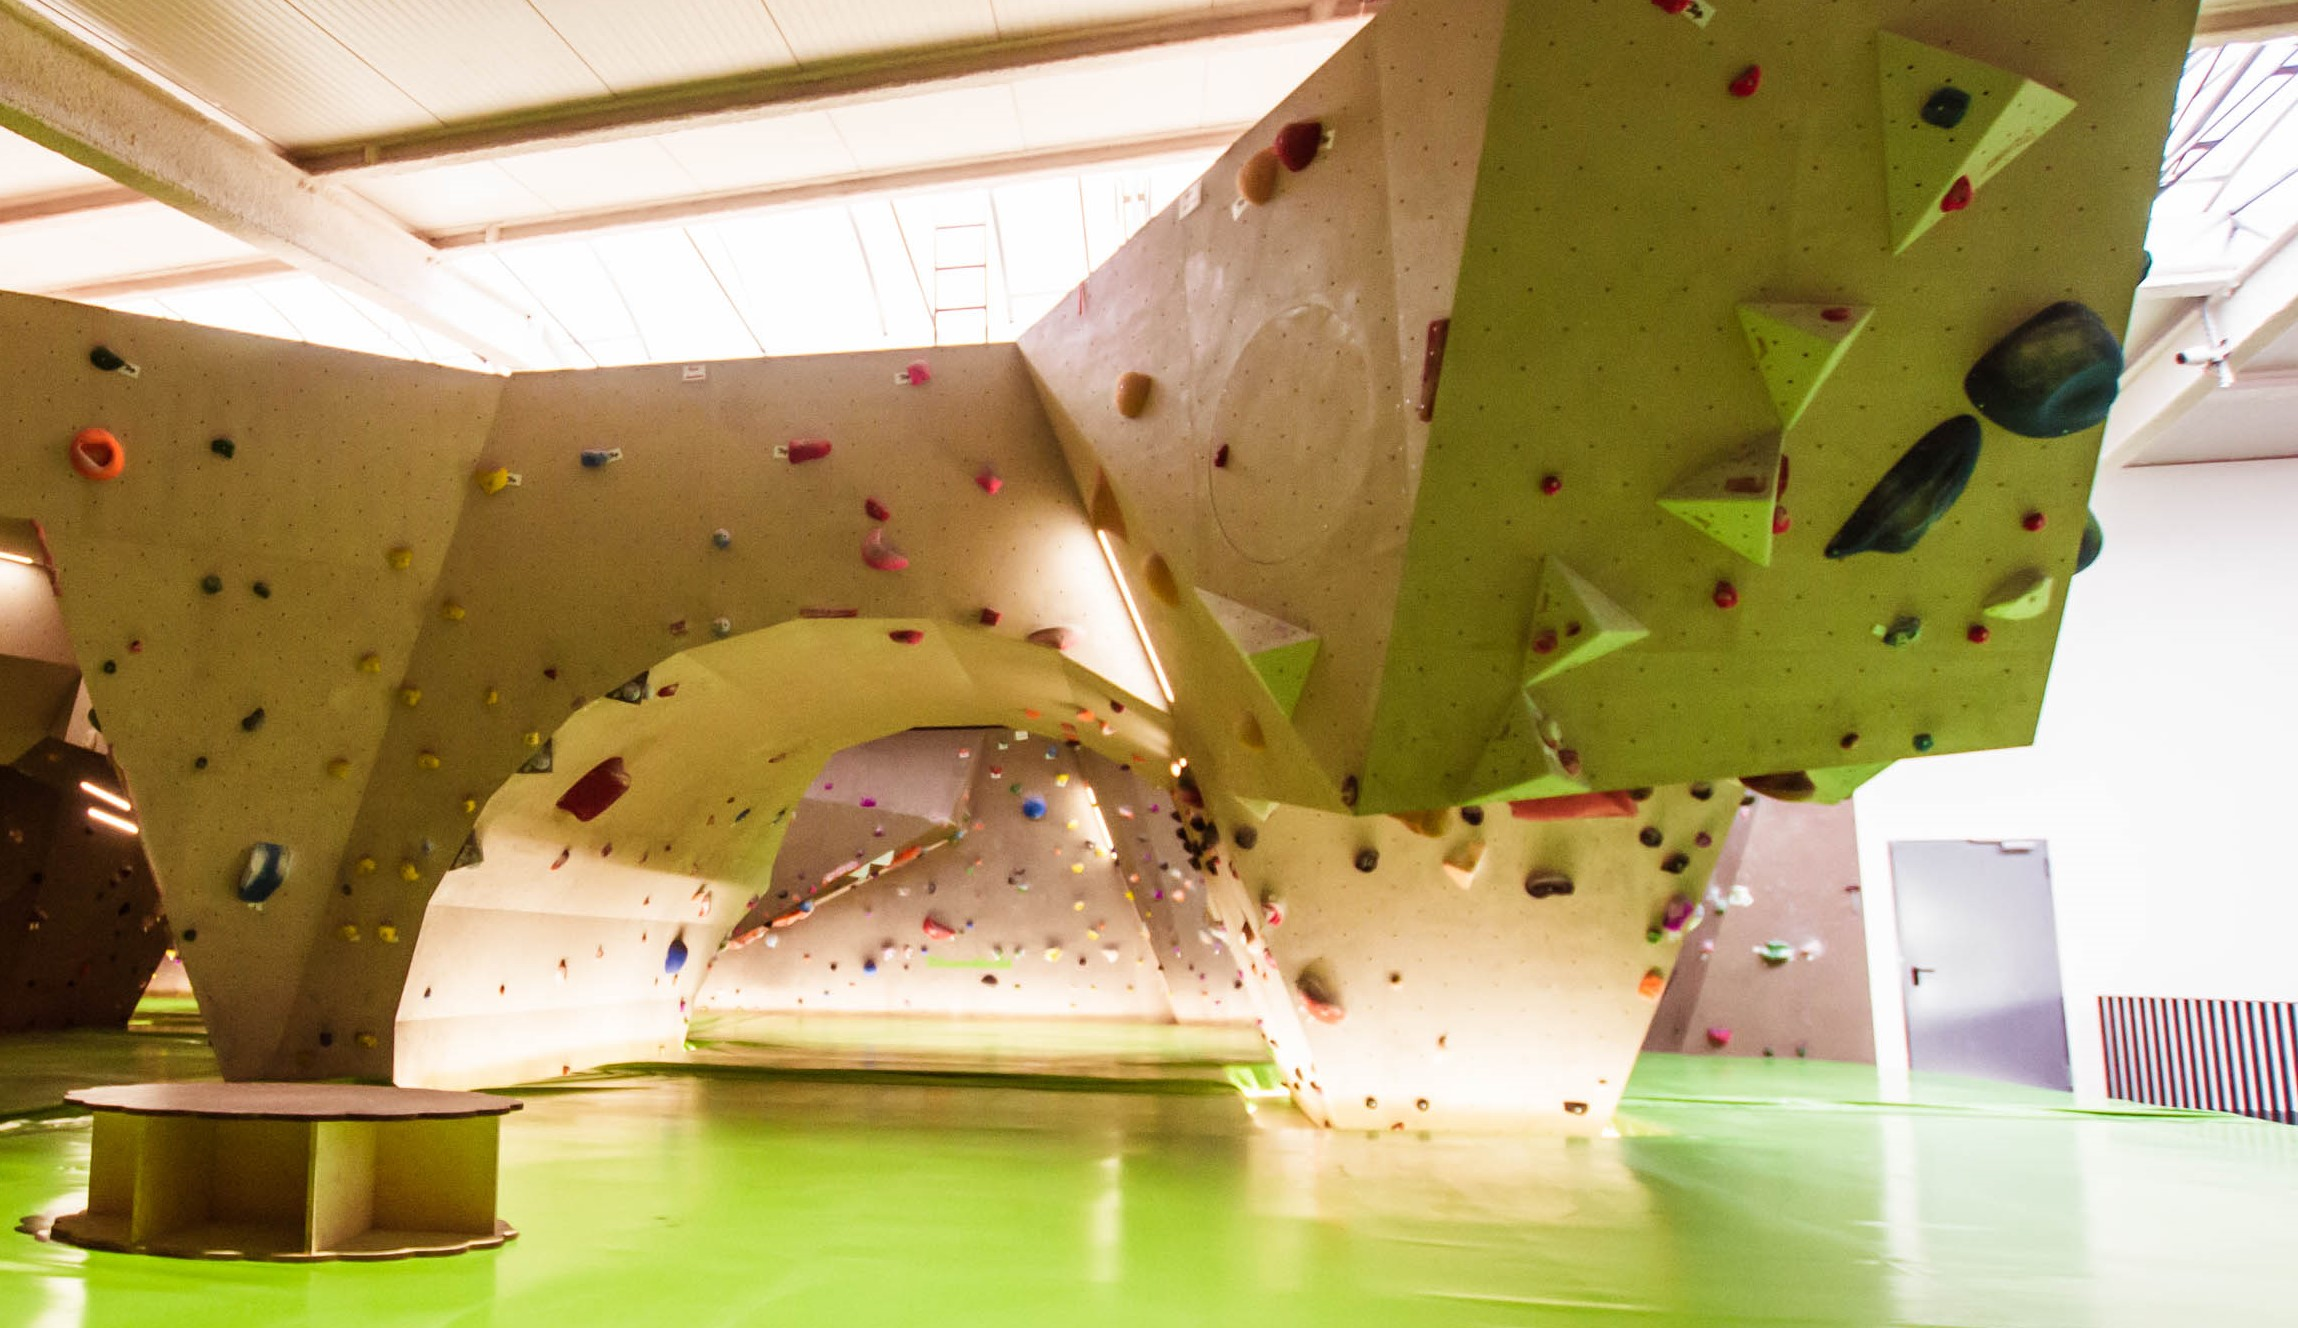 Top Boulderhalle - Vels Boulderhalle Stuttgart